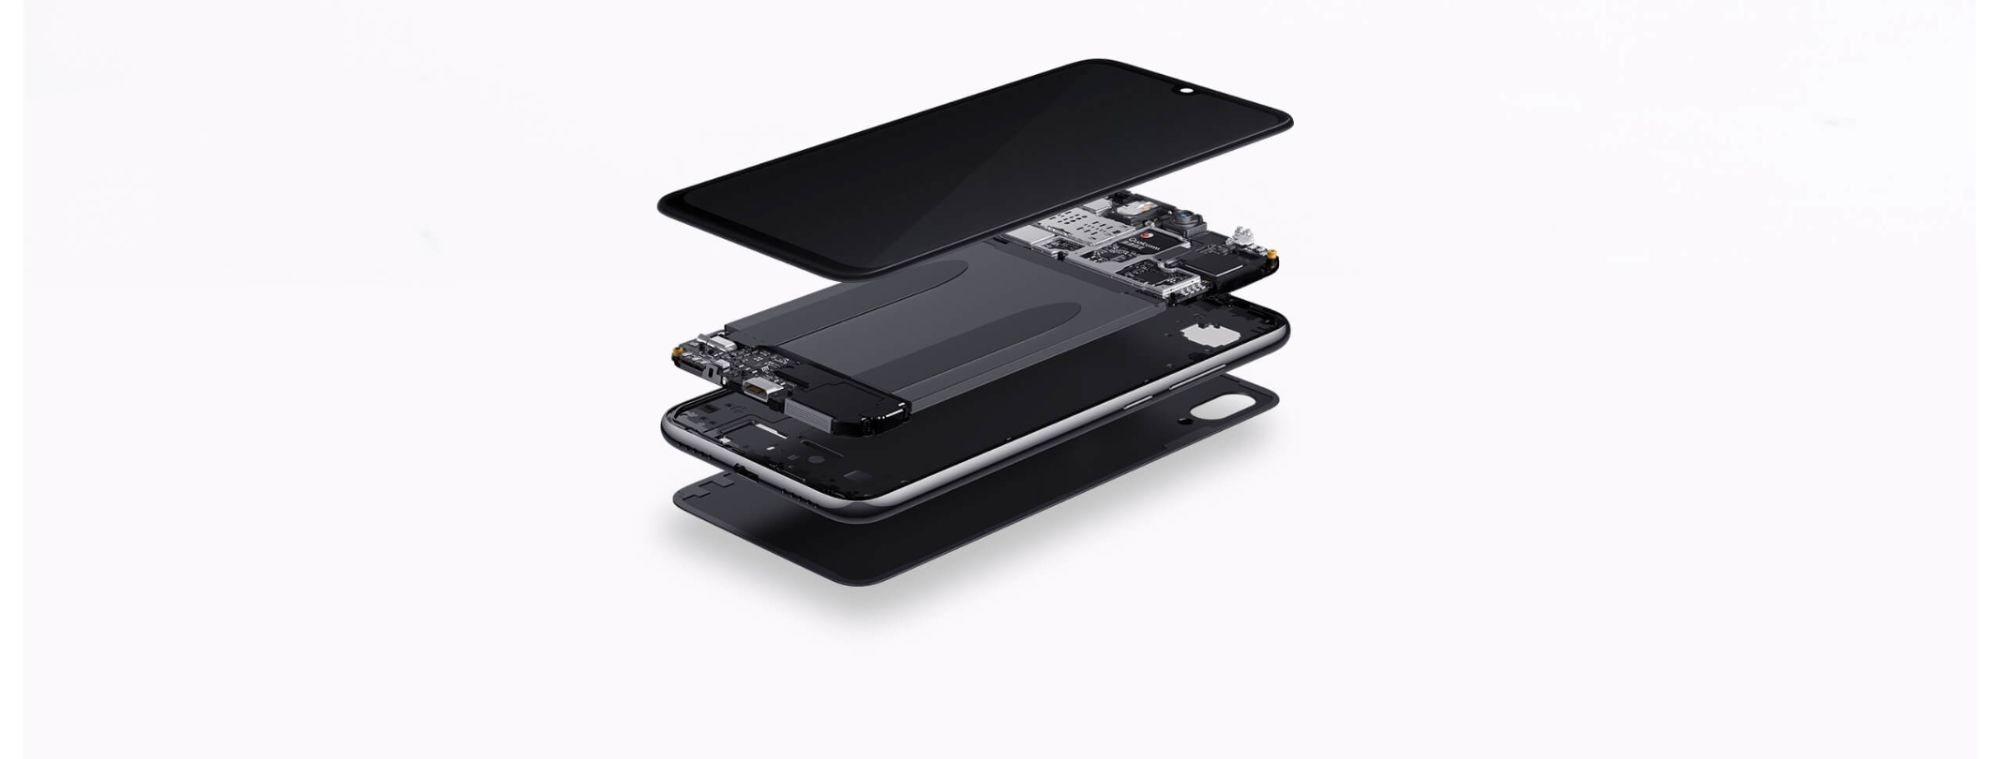 Xiaomi Redmi Note 7 64 Go (RAM 4 Go) Dual SIM Noir cosmique image 10   Rakuten